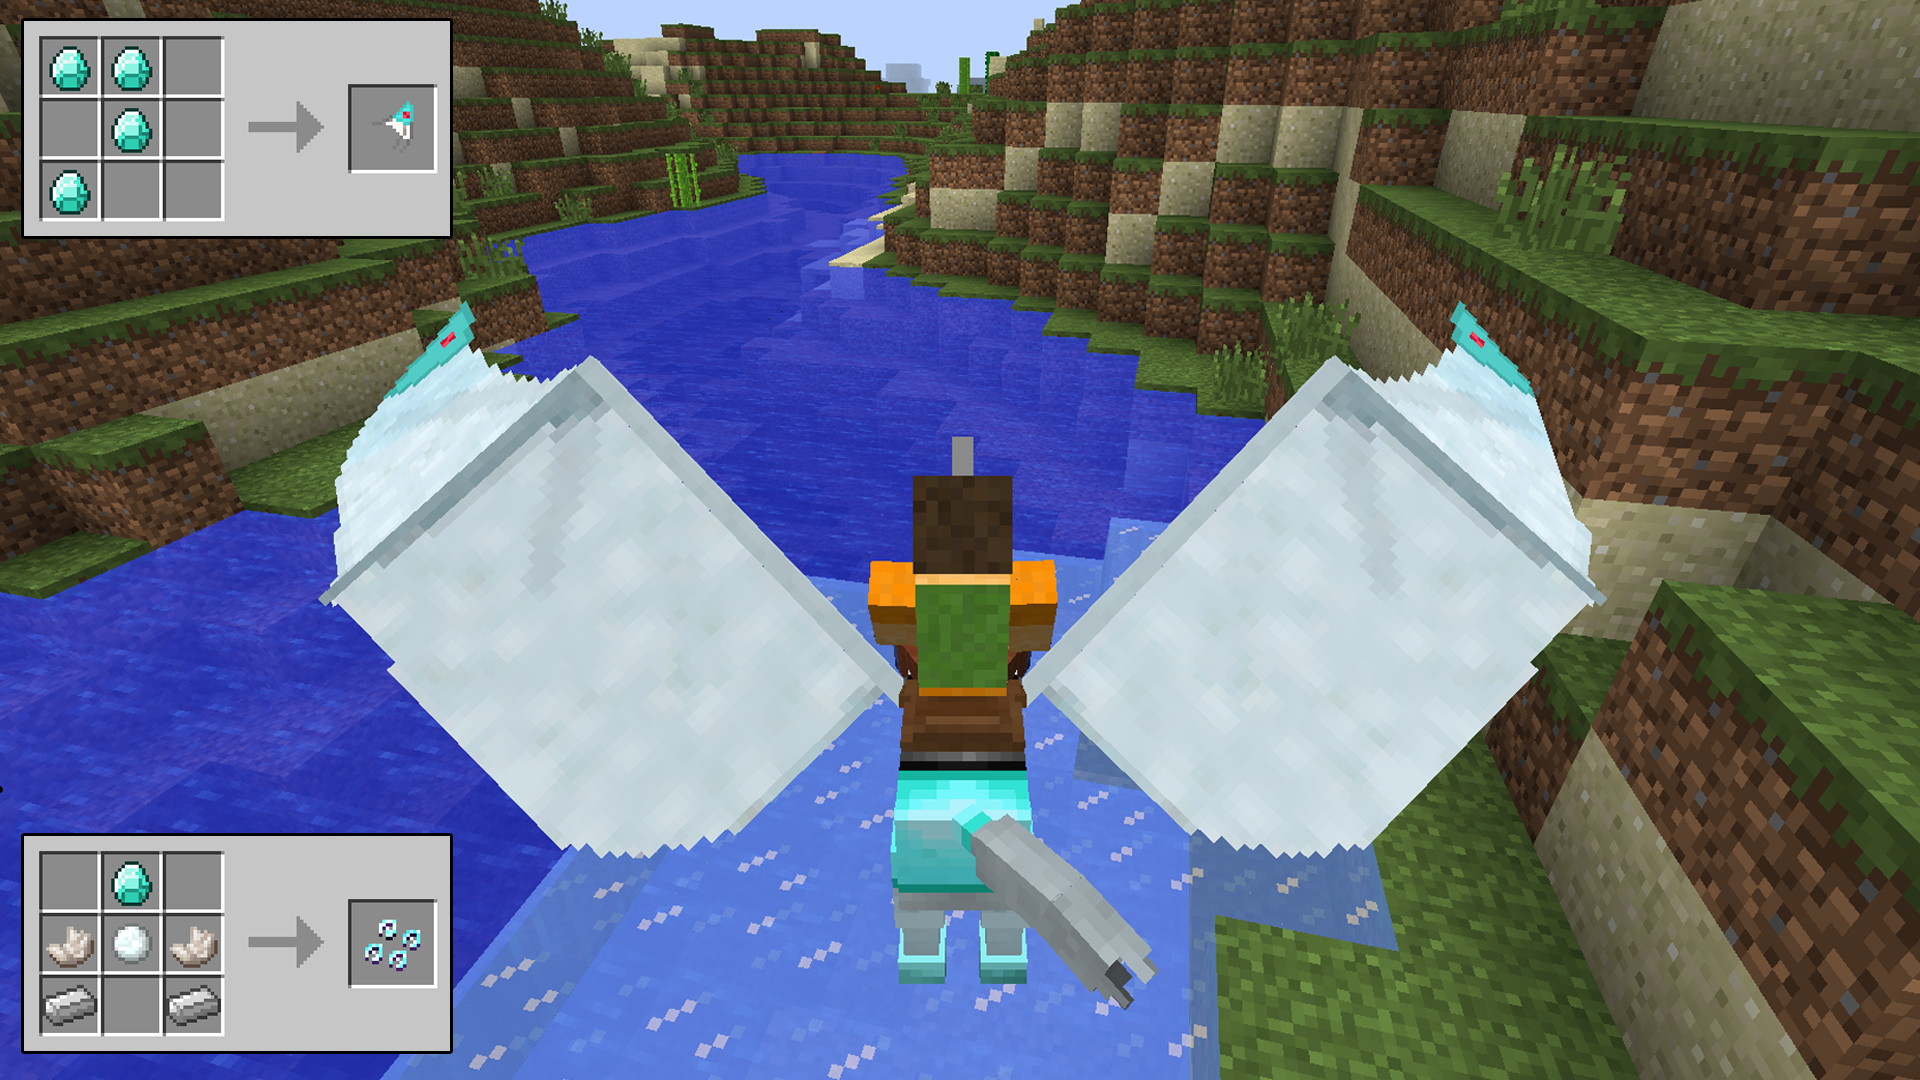 The Ultimate Unicorn Mod (1 7) | Minecraft Mods